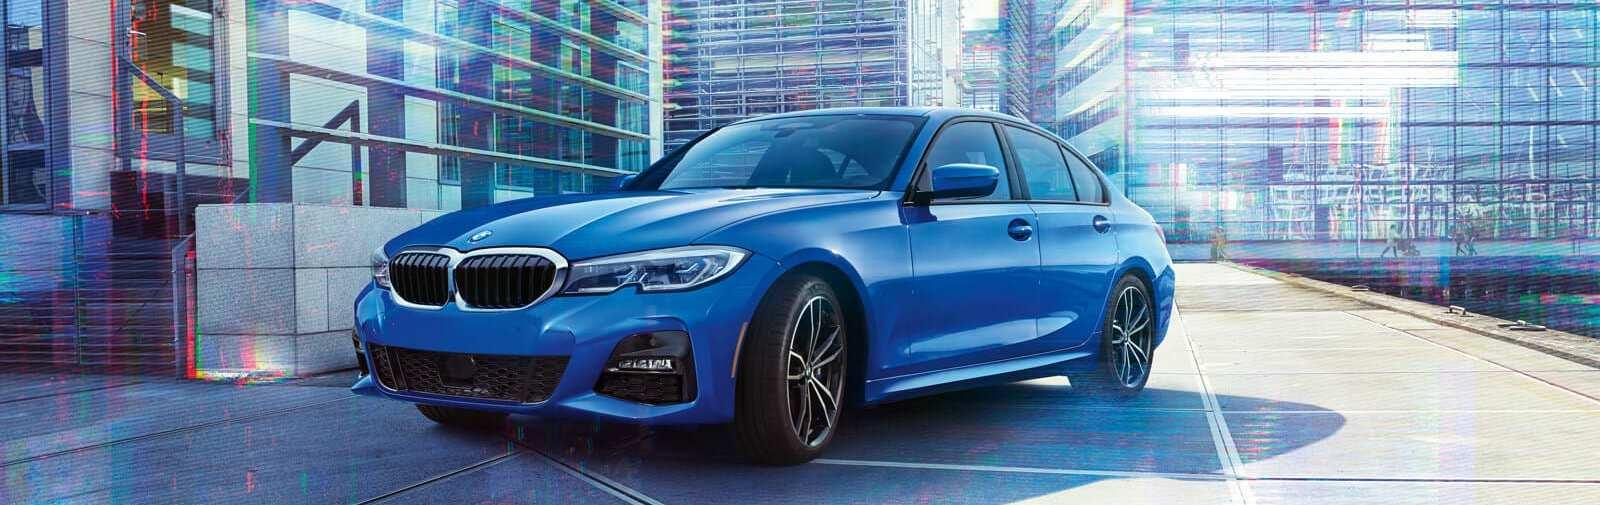 2020 BMW 3 Series for Sale near Dallas, TX